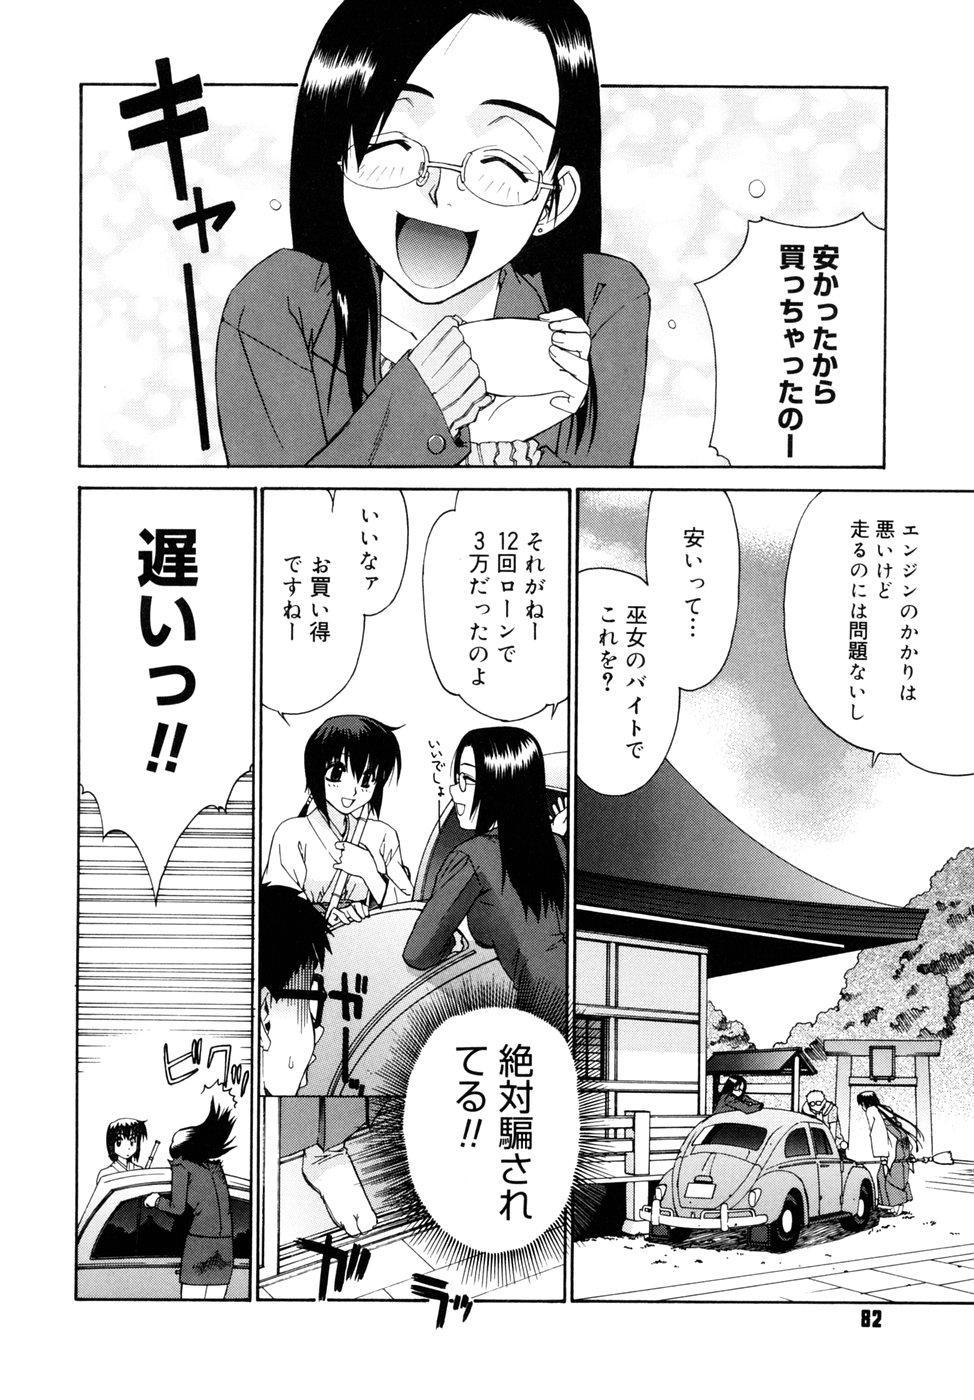 [Yaya Hinata] Tonari no Miko-san wa Minna Warau - The next shrine maidens smile in everyone. 81